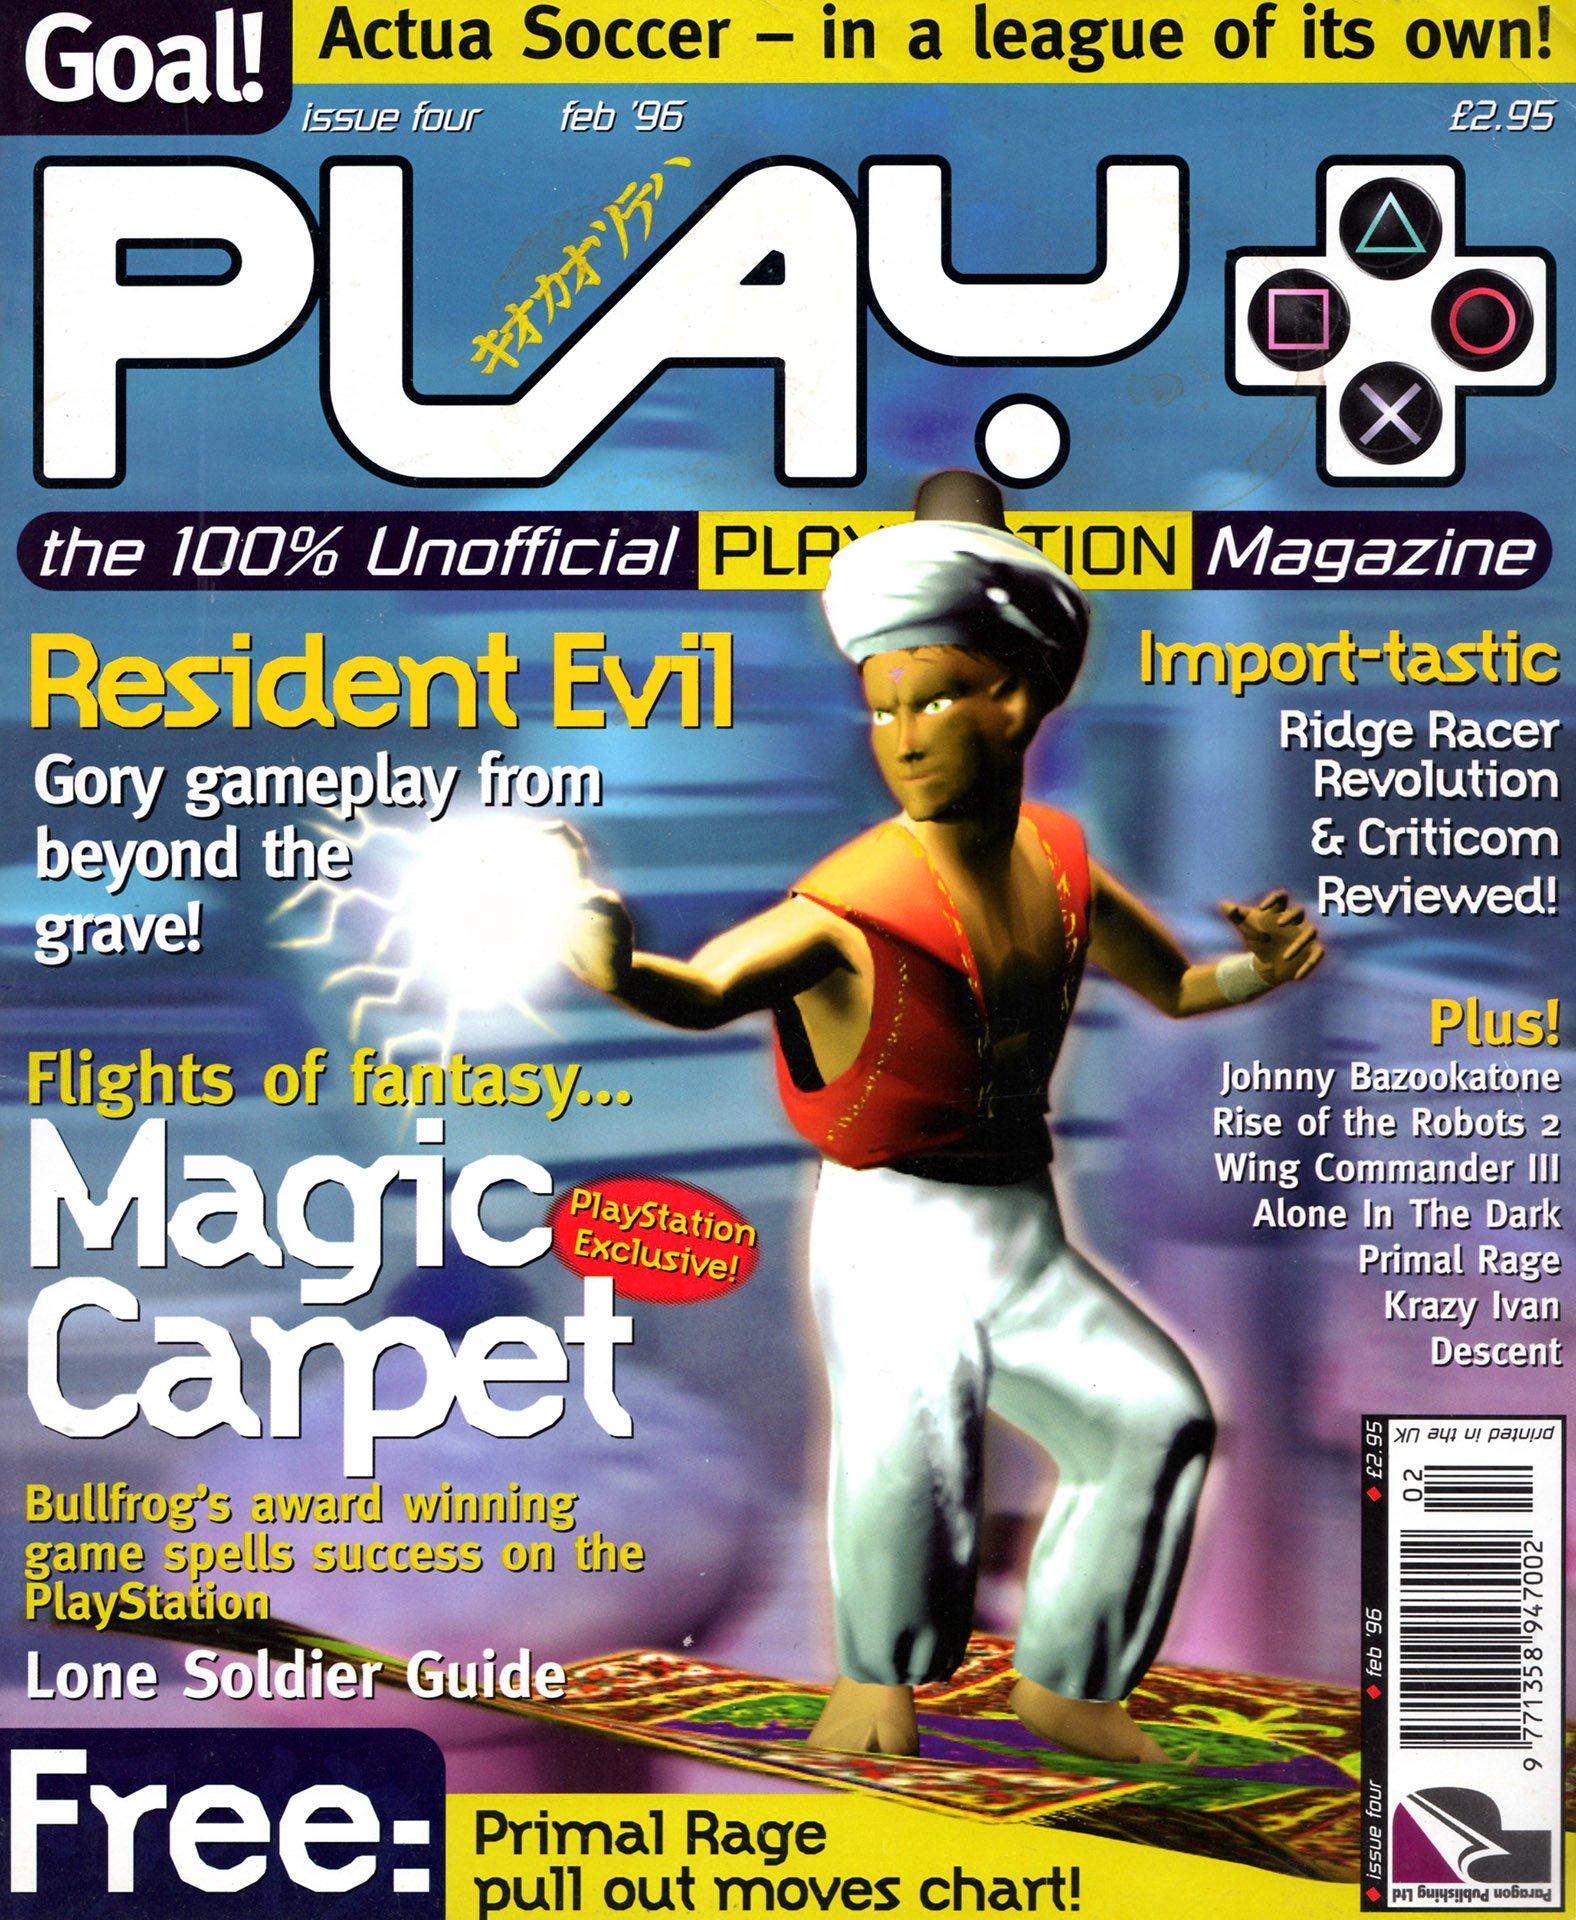 Play UK 004 (February 1996)